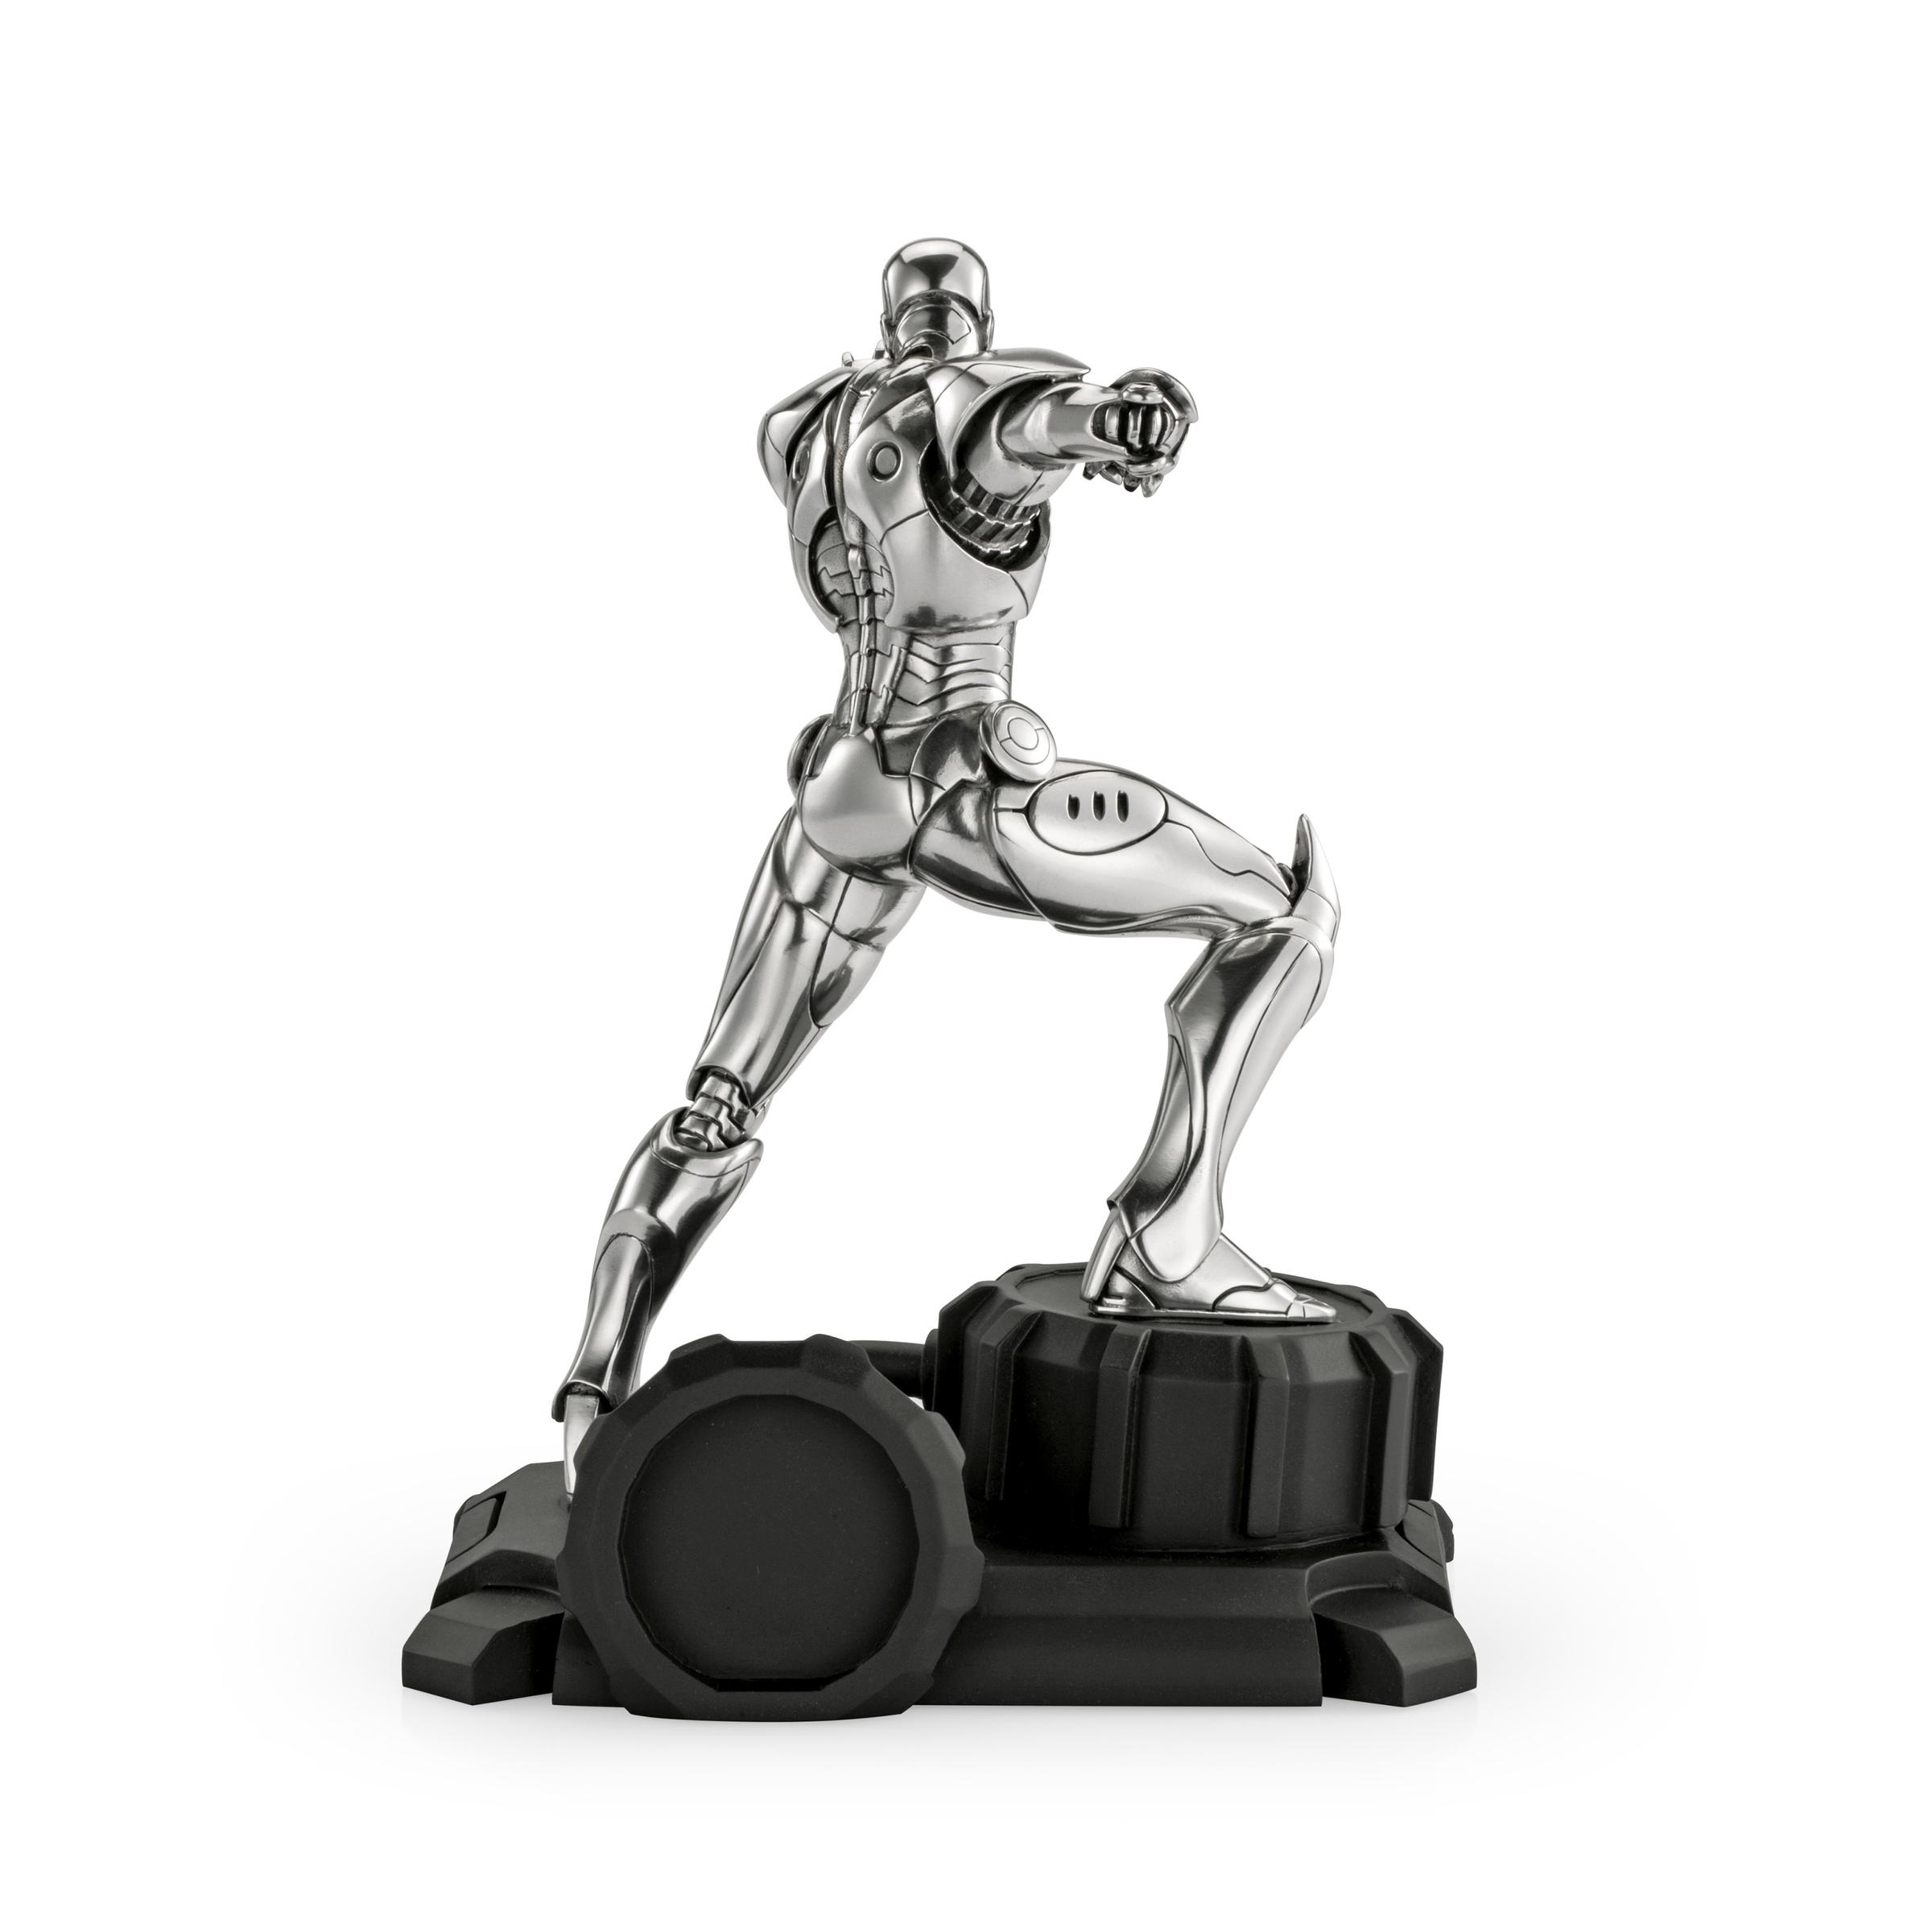 limited-edition-iron-man-figurine-7.jpg